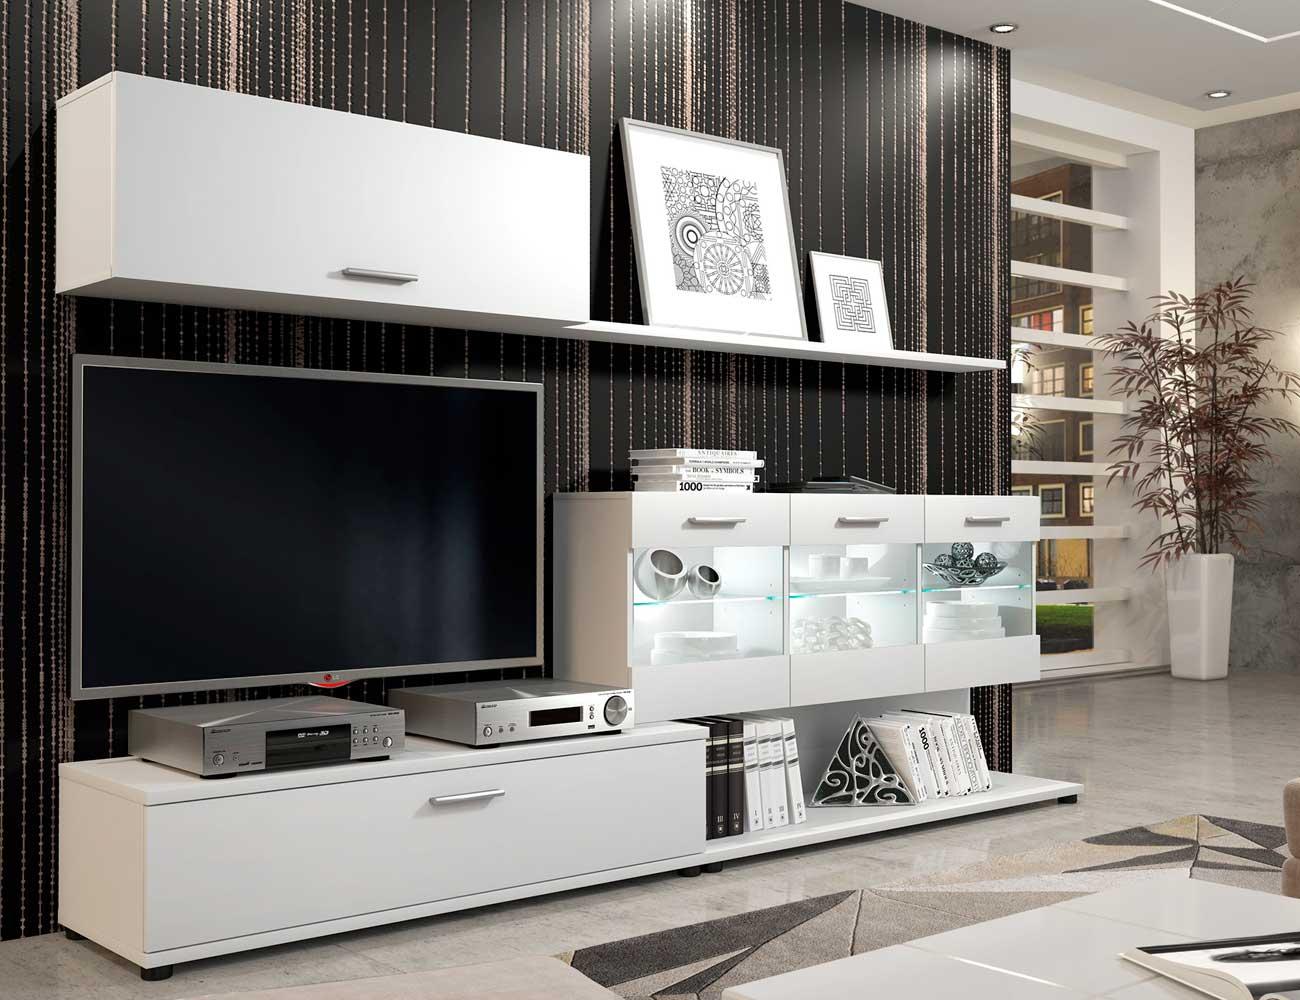 Mueble de sal n estilo moderno con luces leds y blanco - Salon moderno blanco ...